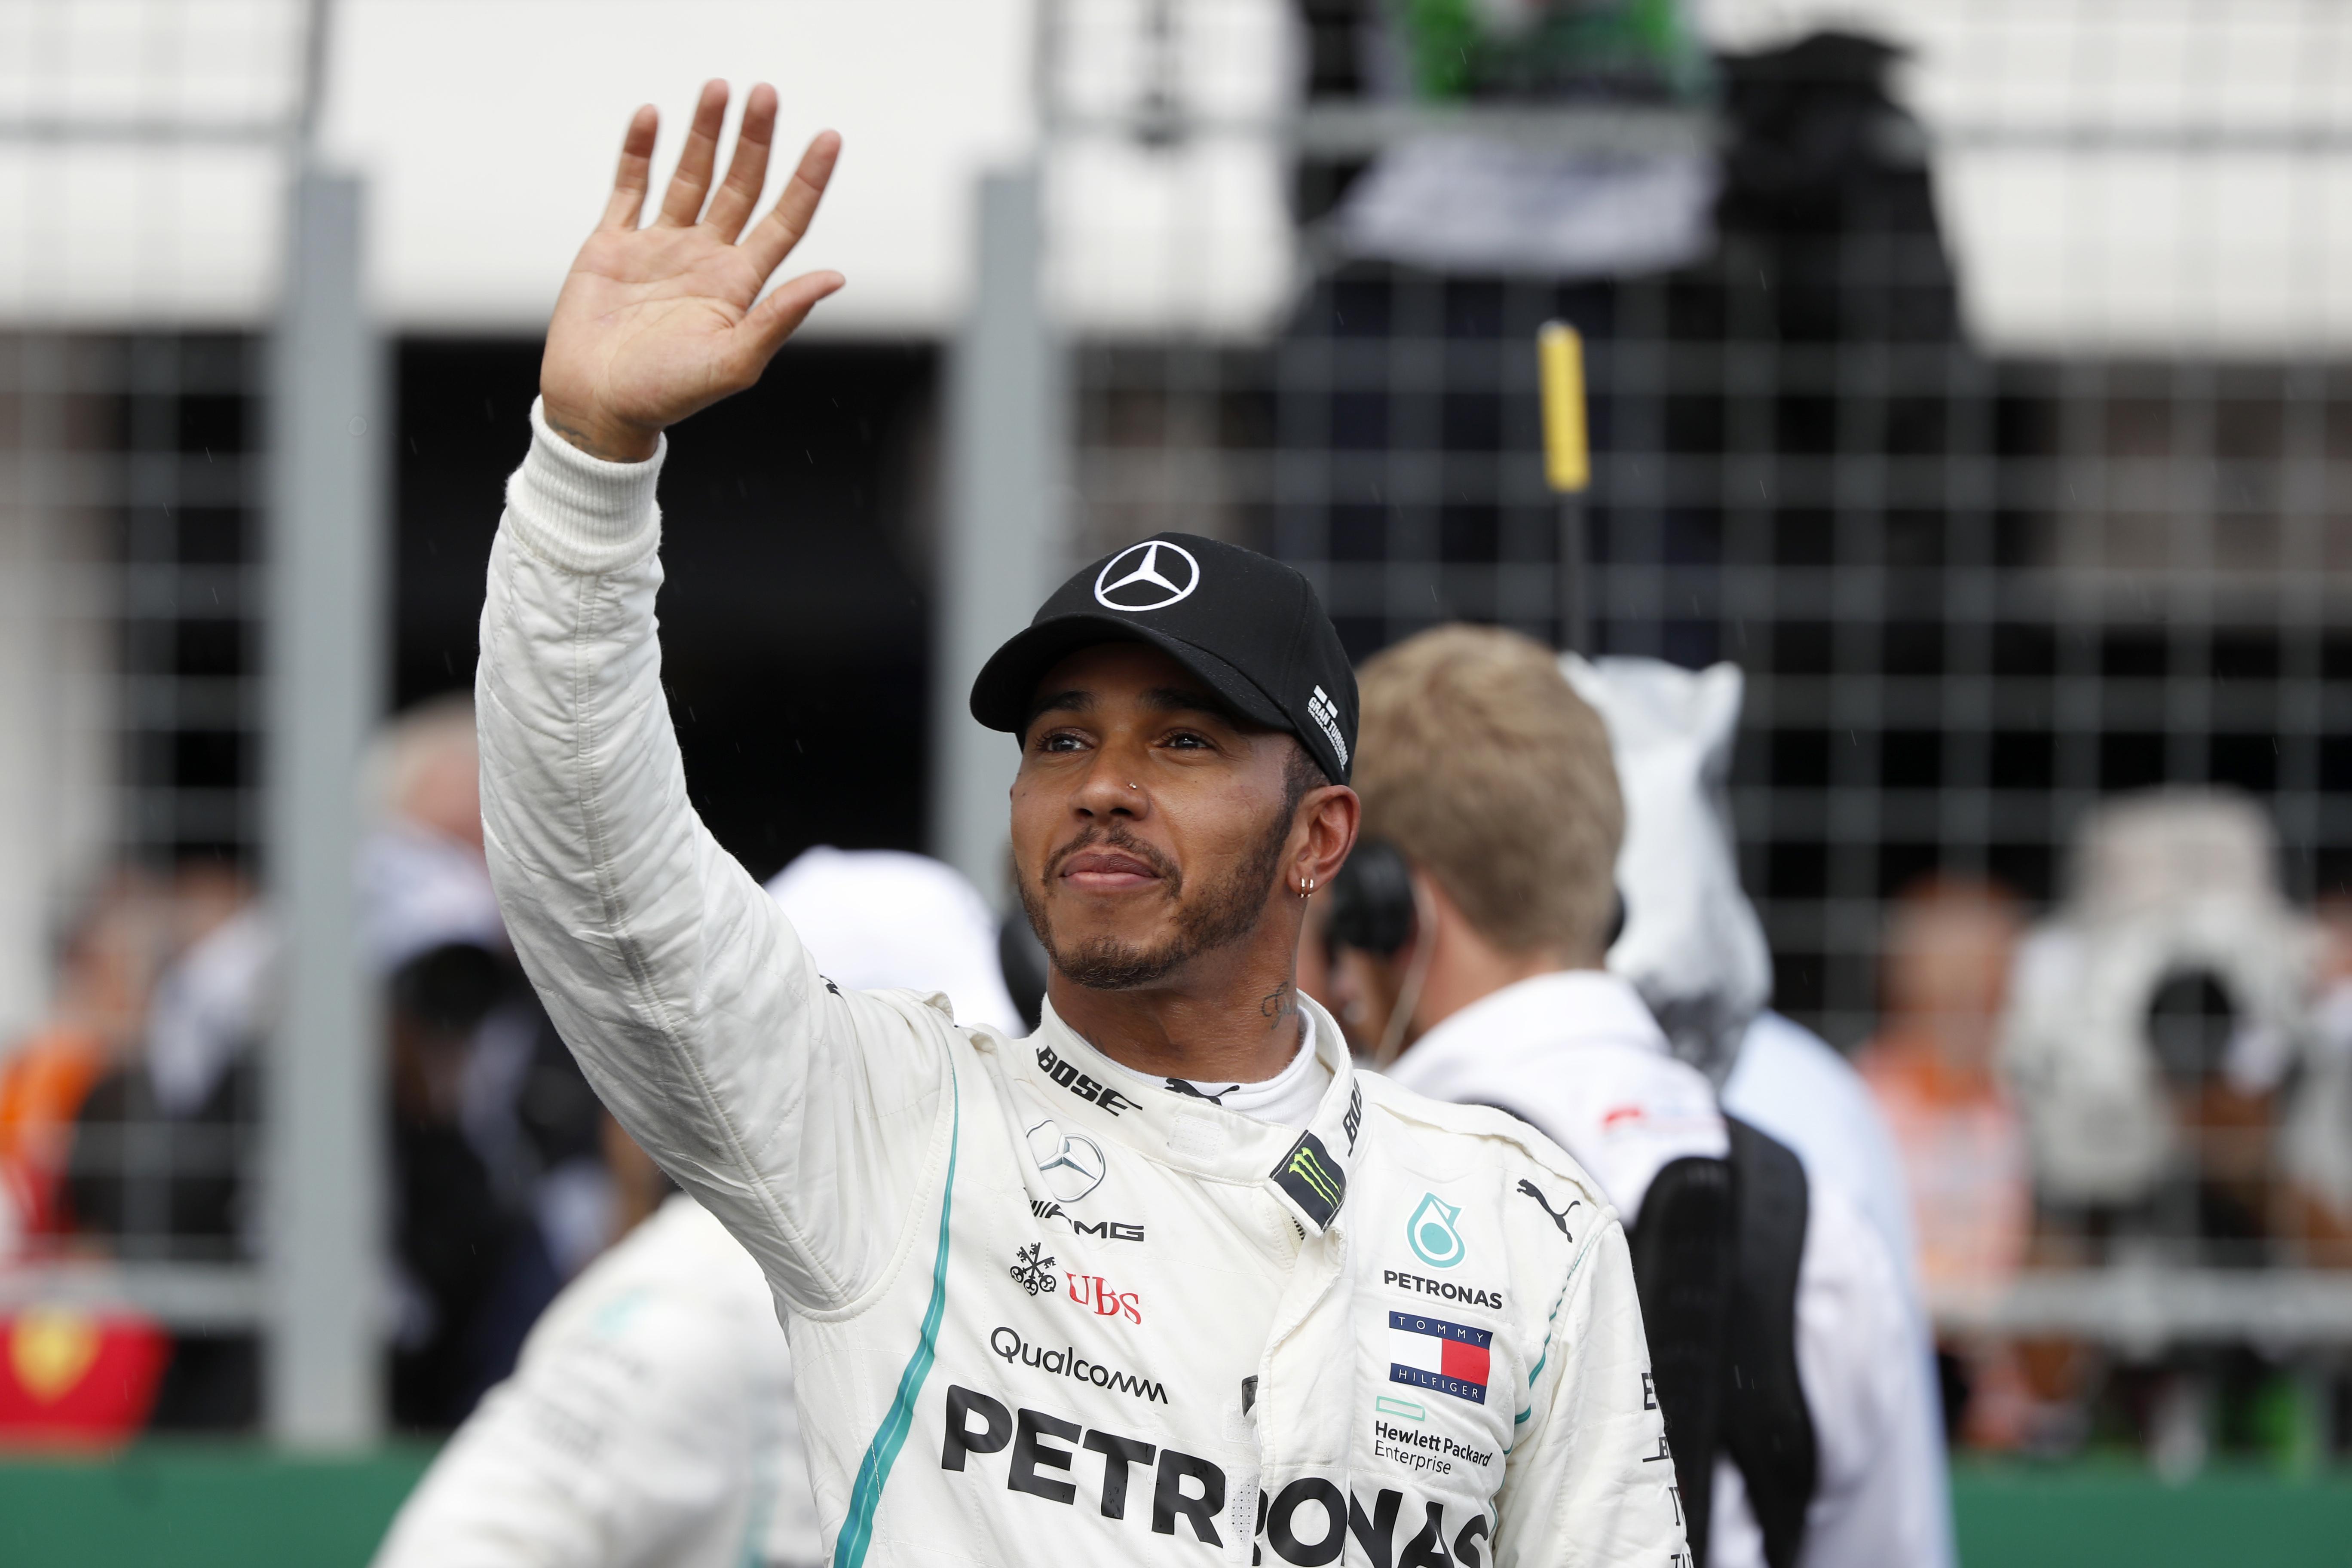 Hamilton claimed pole on a rain-soaked Hungaroring circuit